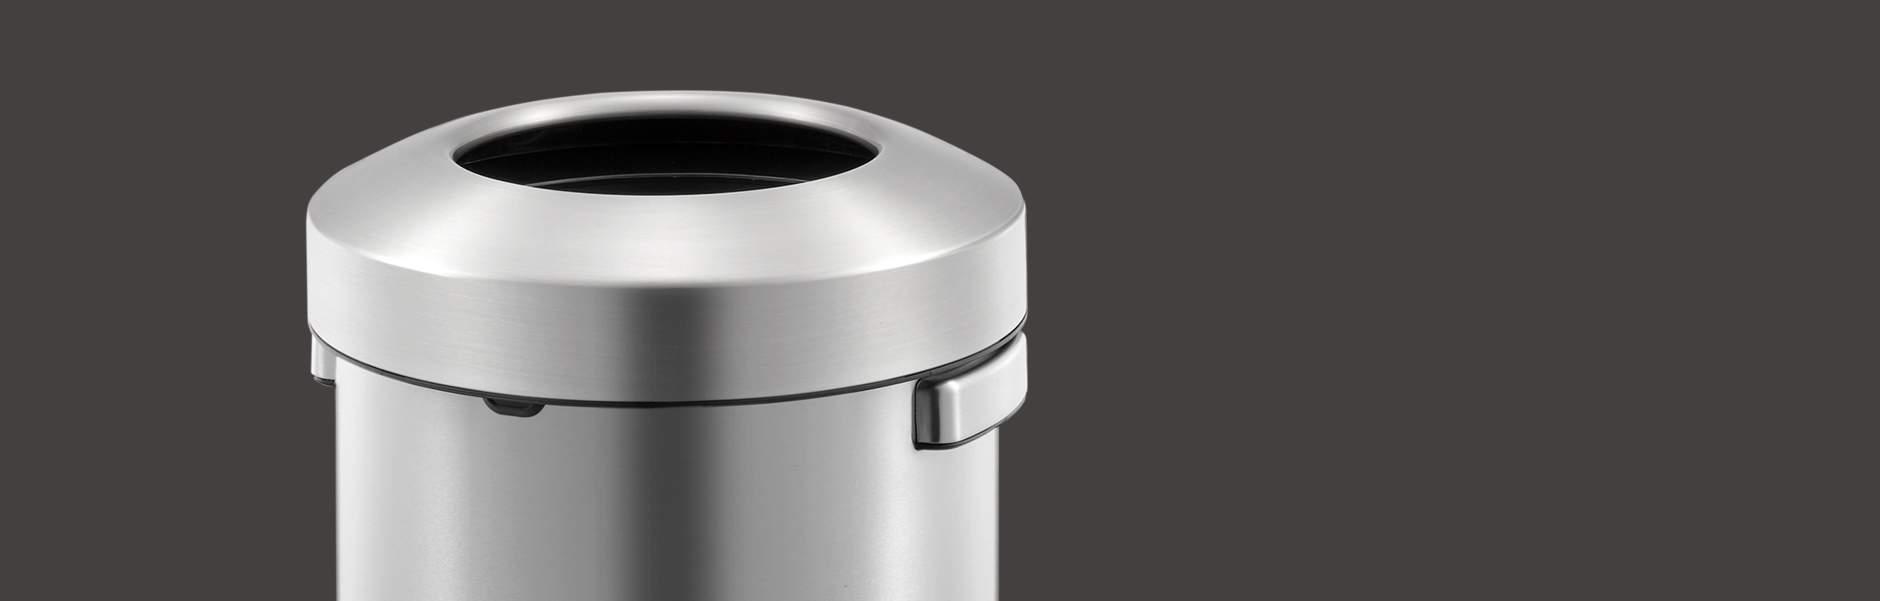 سطل زباله 60 لیتر OPENBIN اکو (EKO) مدل URBAN